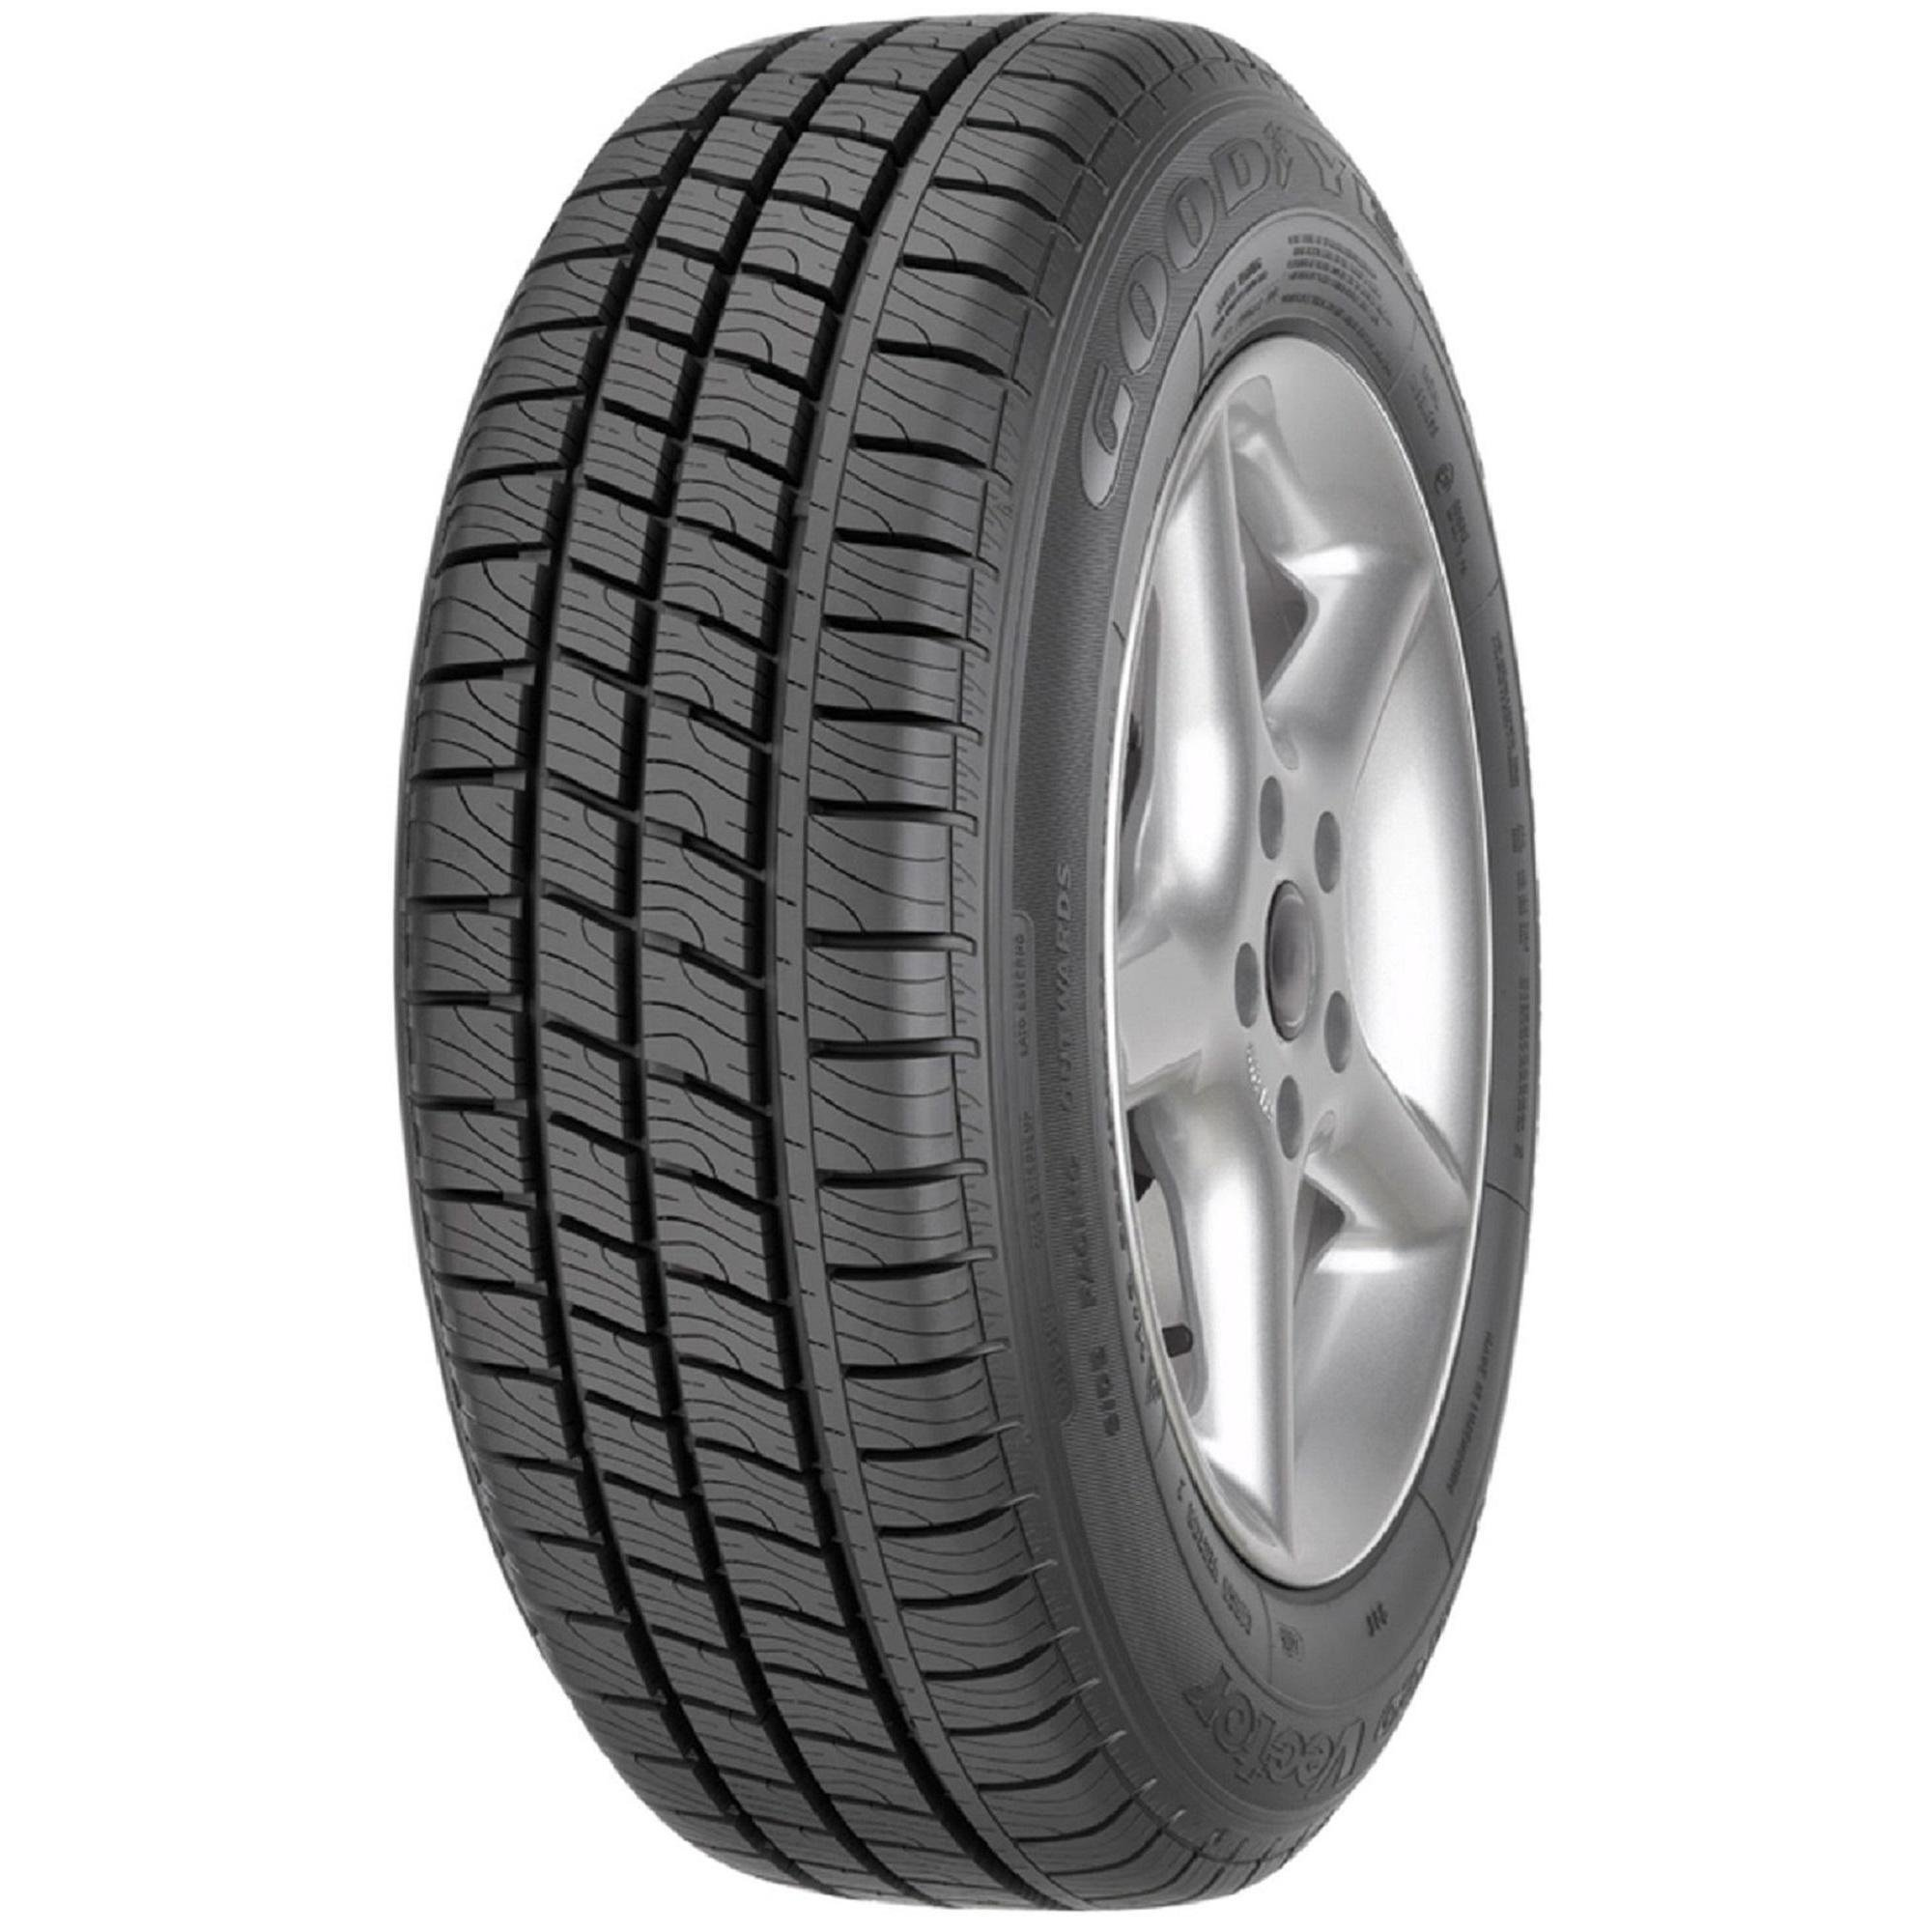 Neumático GOODYEAR CAVE2 195/75R16 107 R